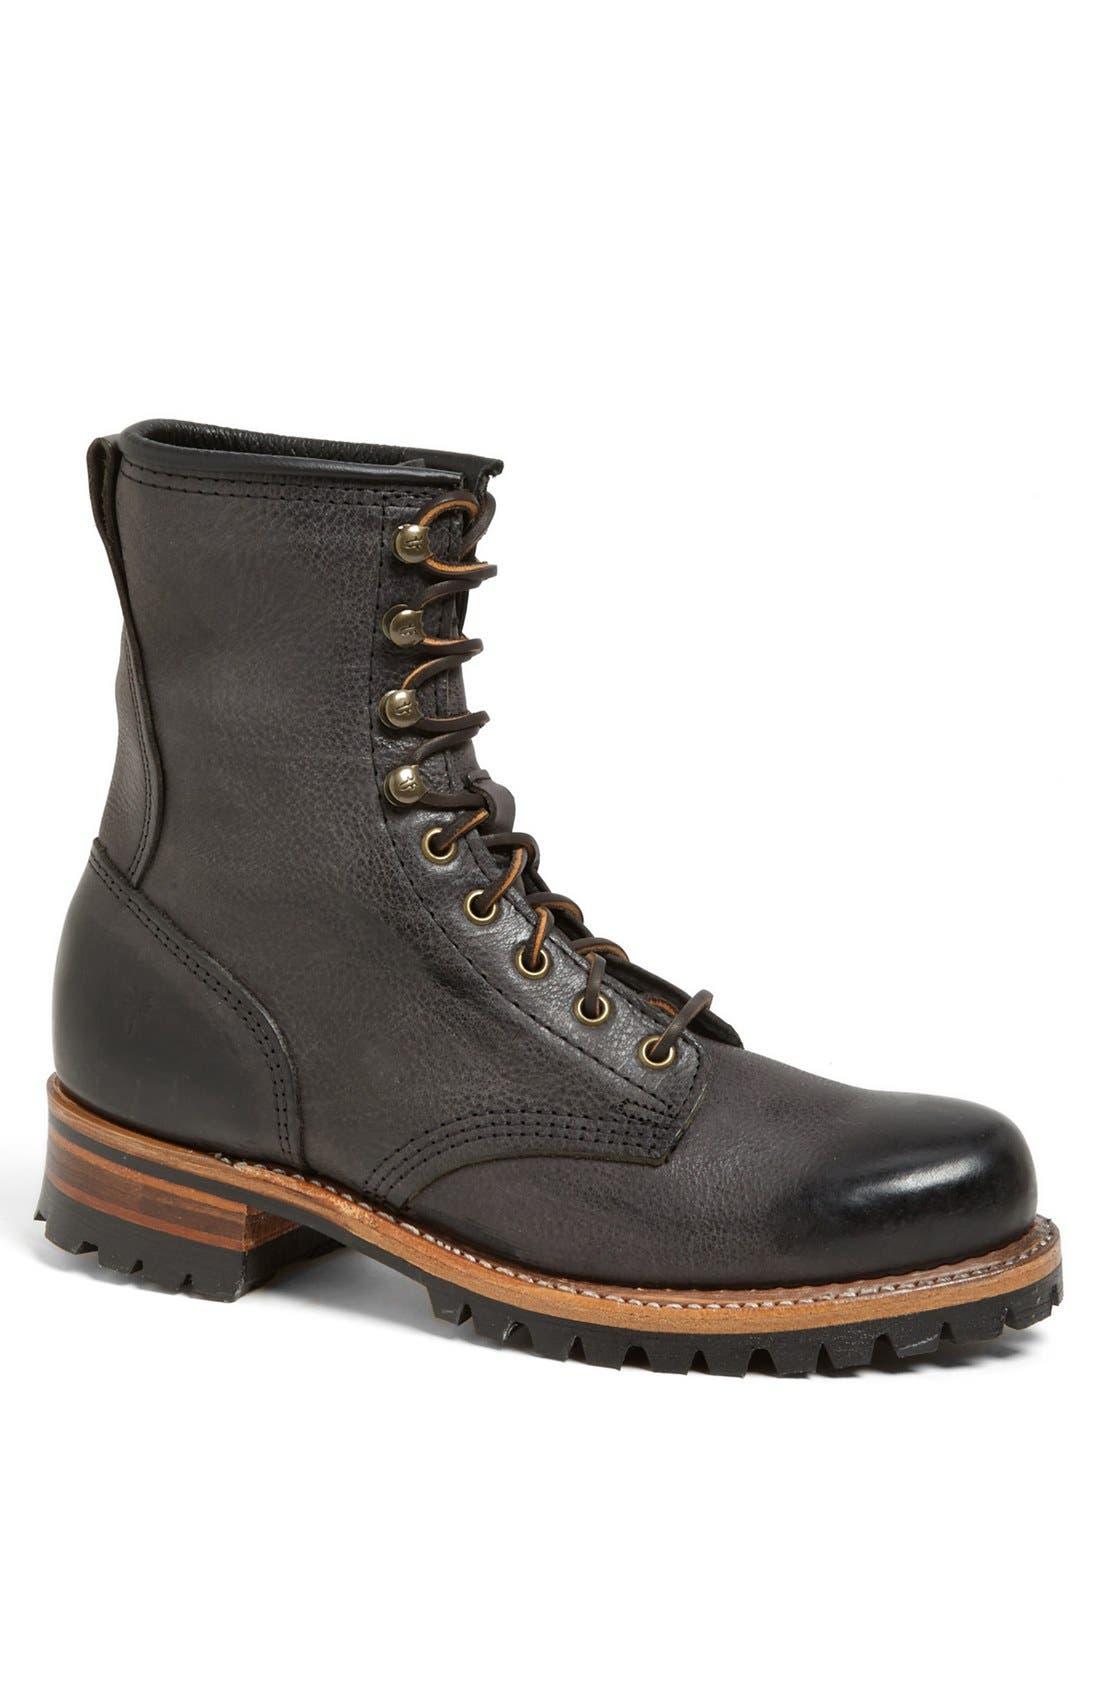 Main Image - Frye 'Logger' Boot